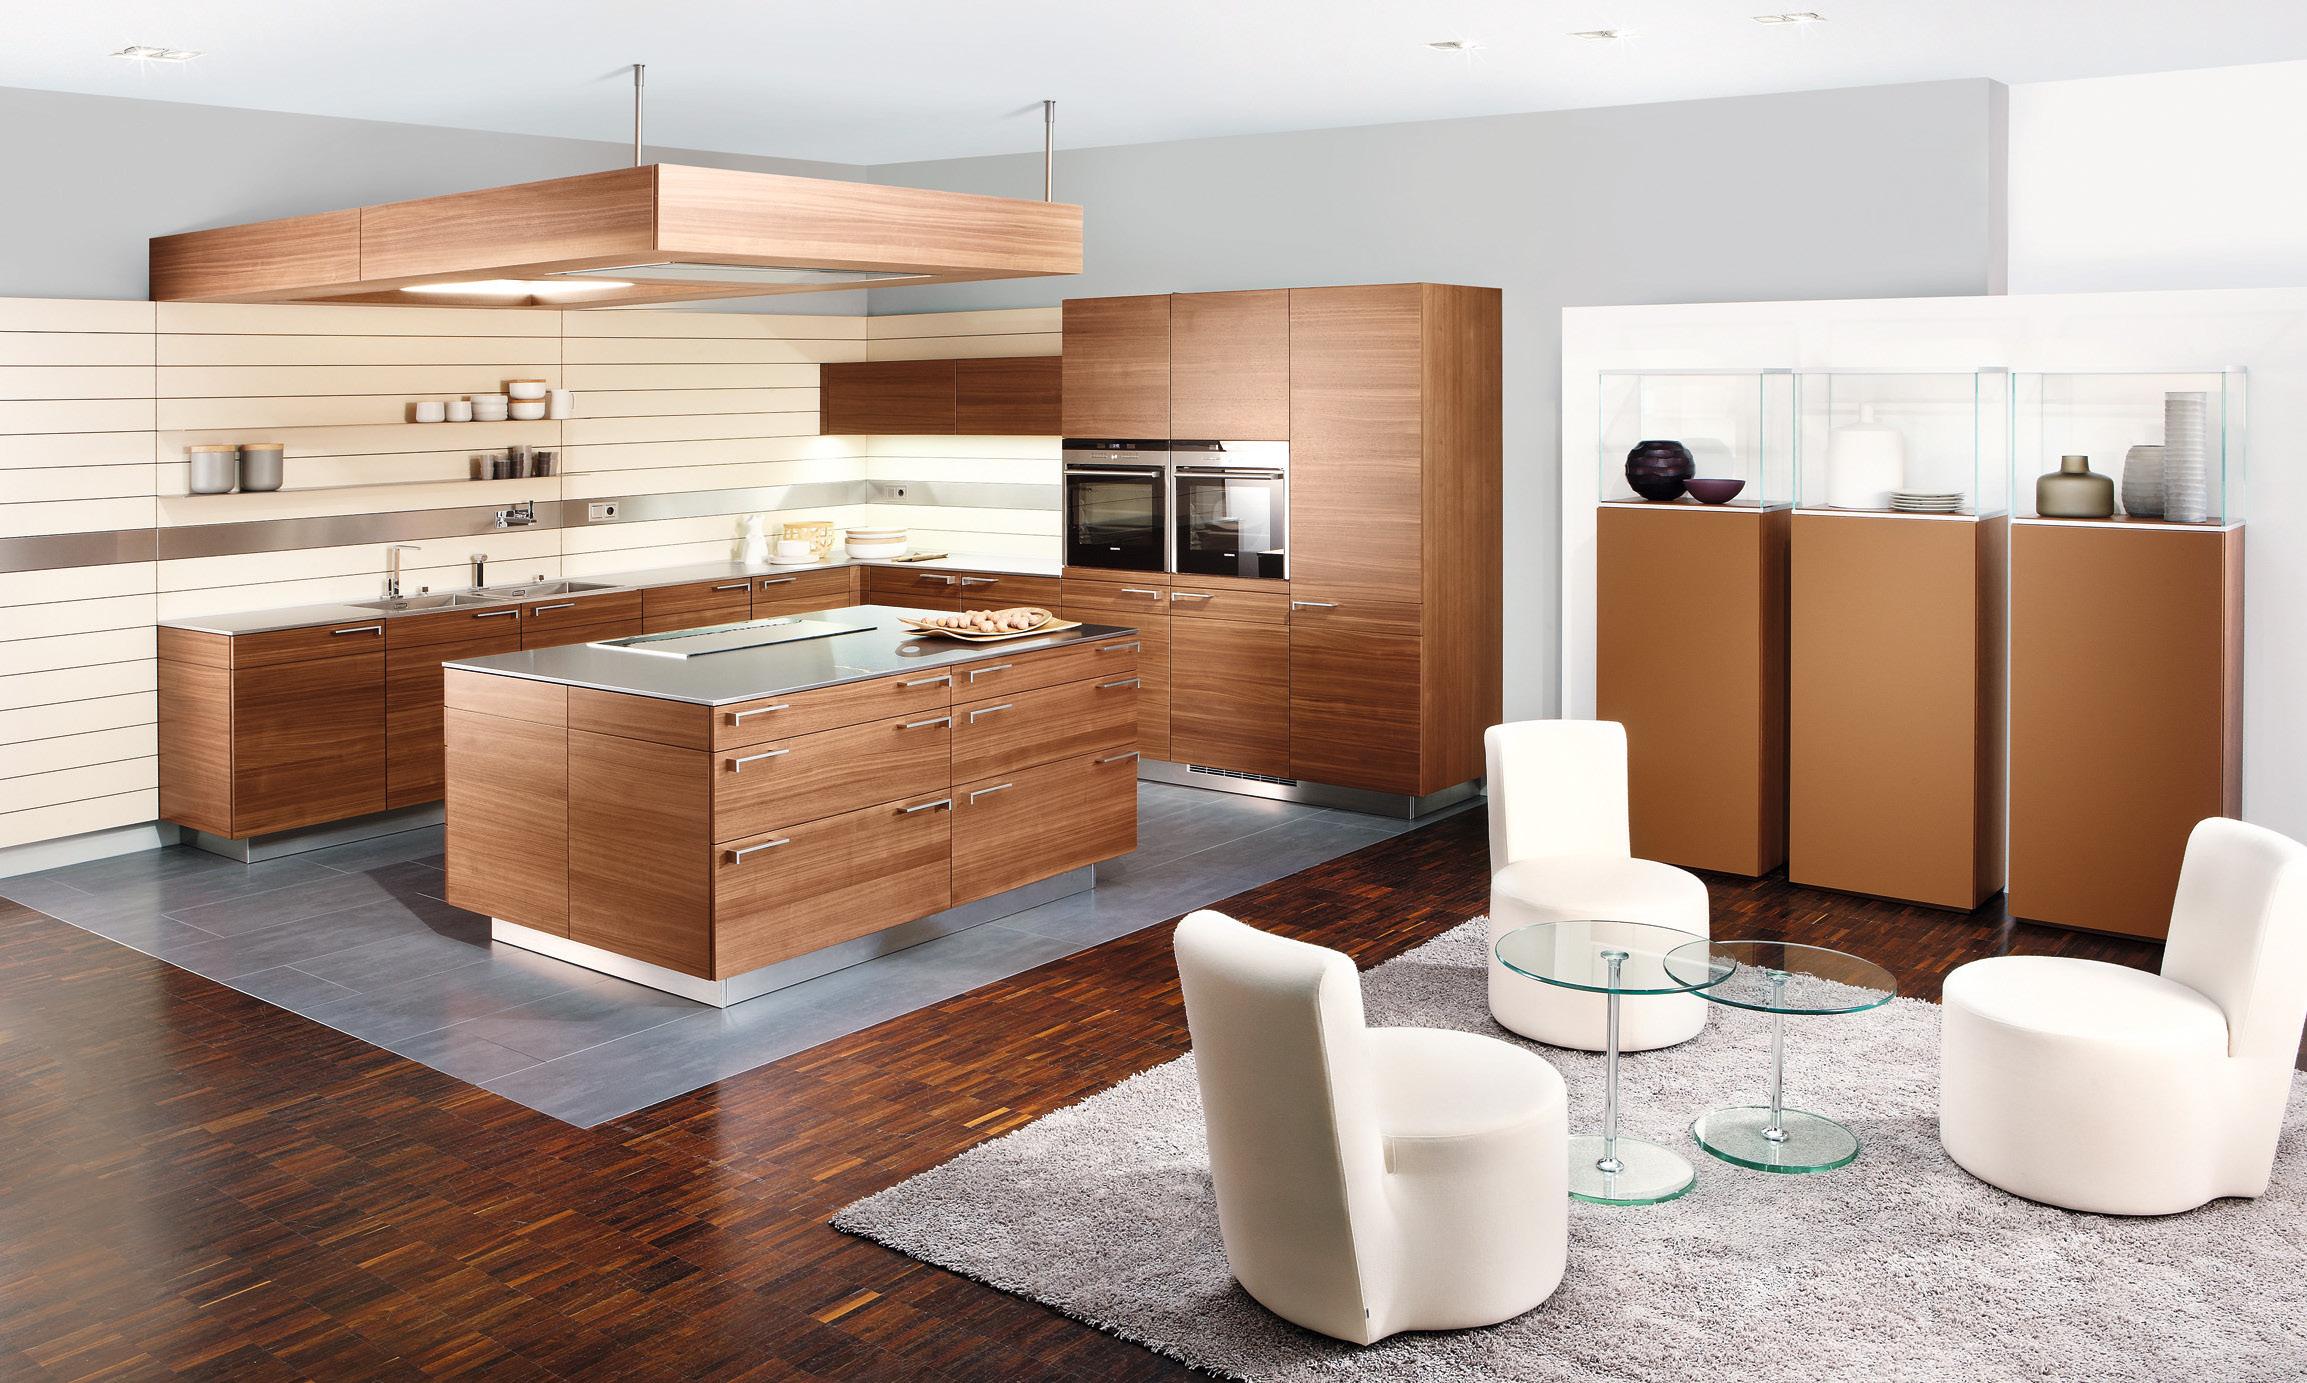 kitchen showrooms sacramento corner bench nar fine carpentry inc brings back poggenpohl courtesy of